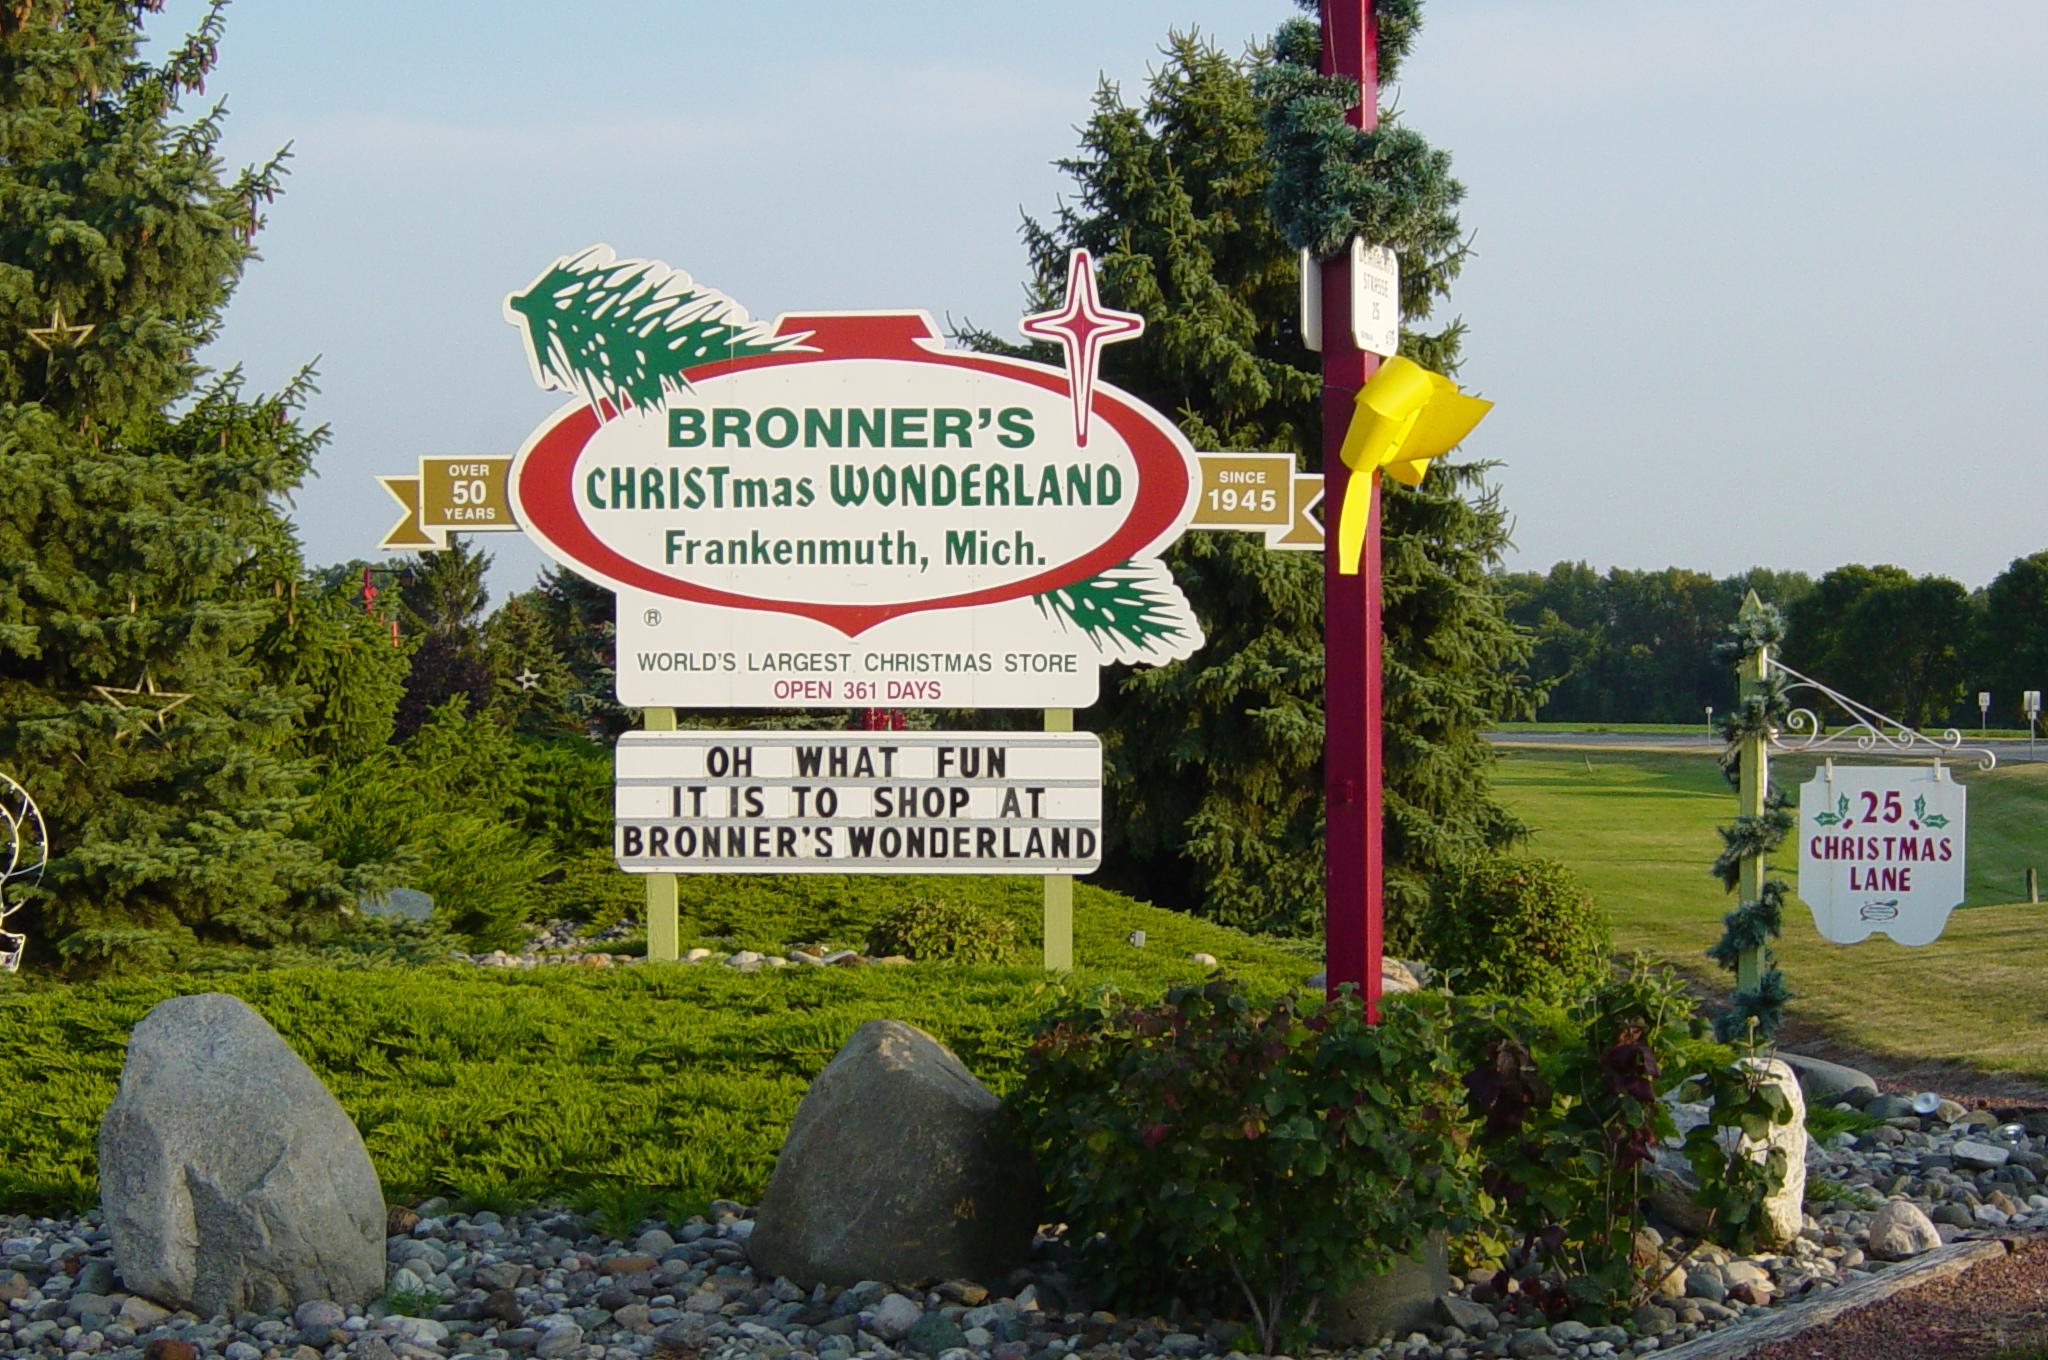 Bronners Christmas Wonderland.Bronner S Christmas Wonderland Wikipedia